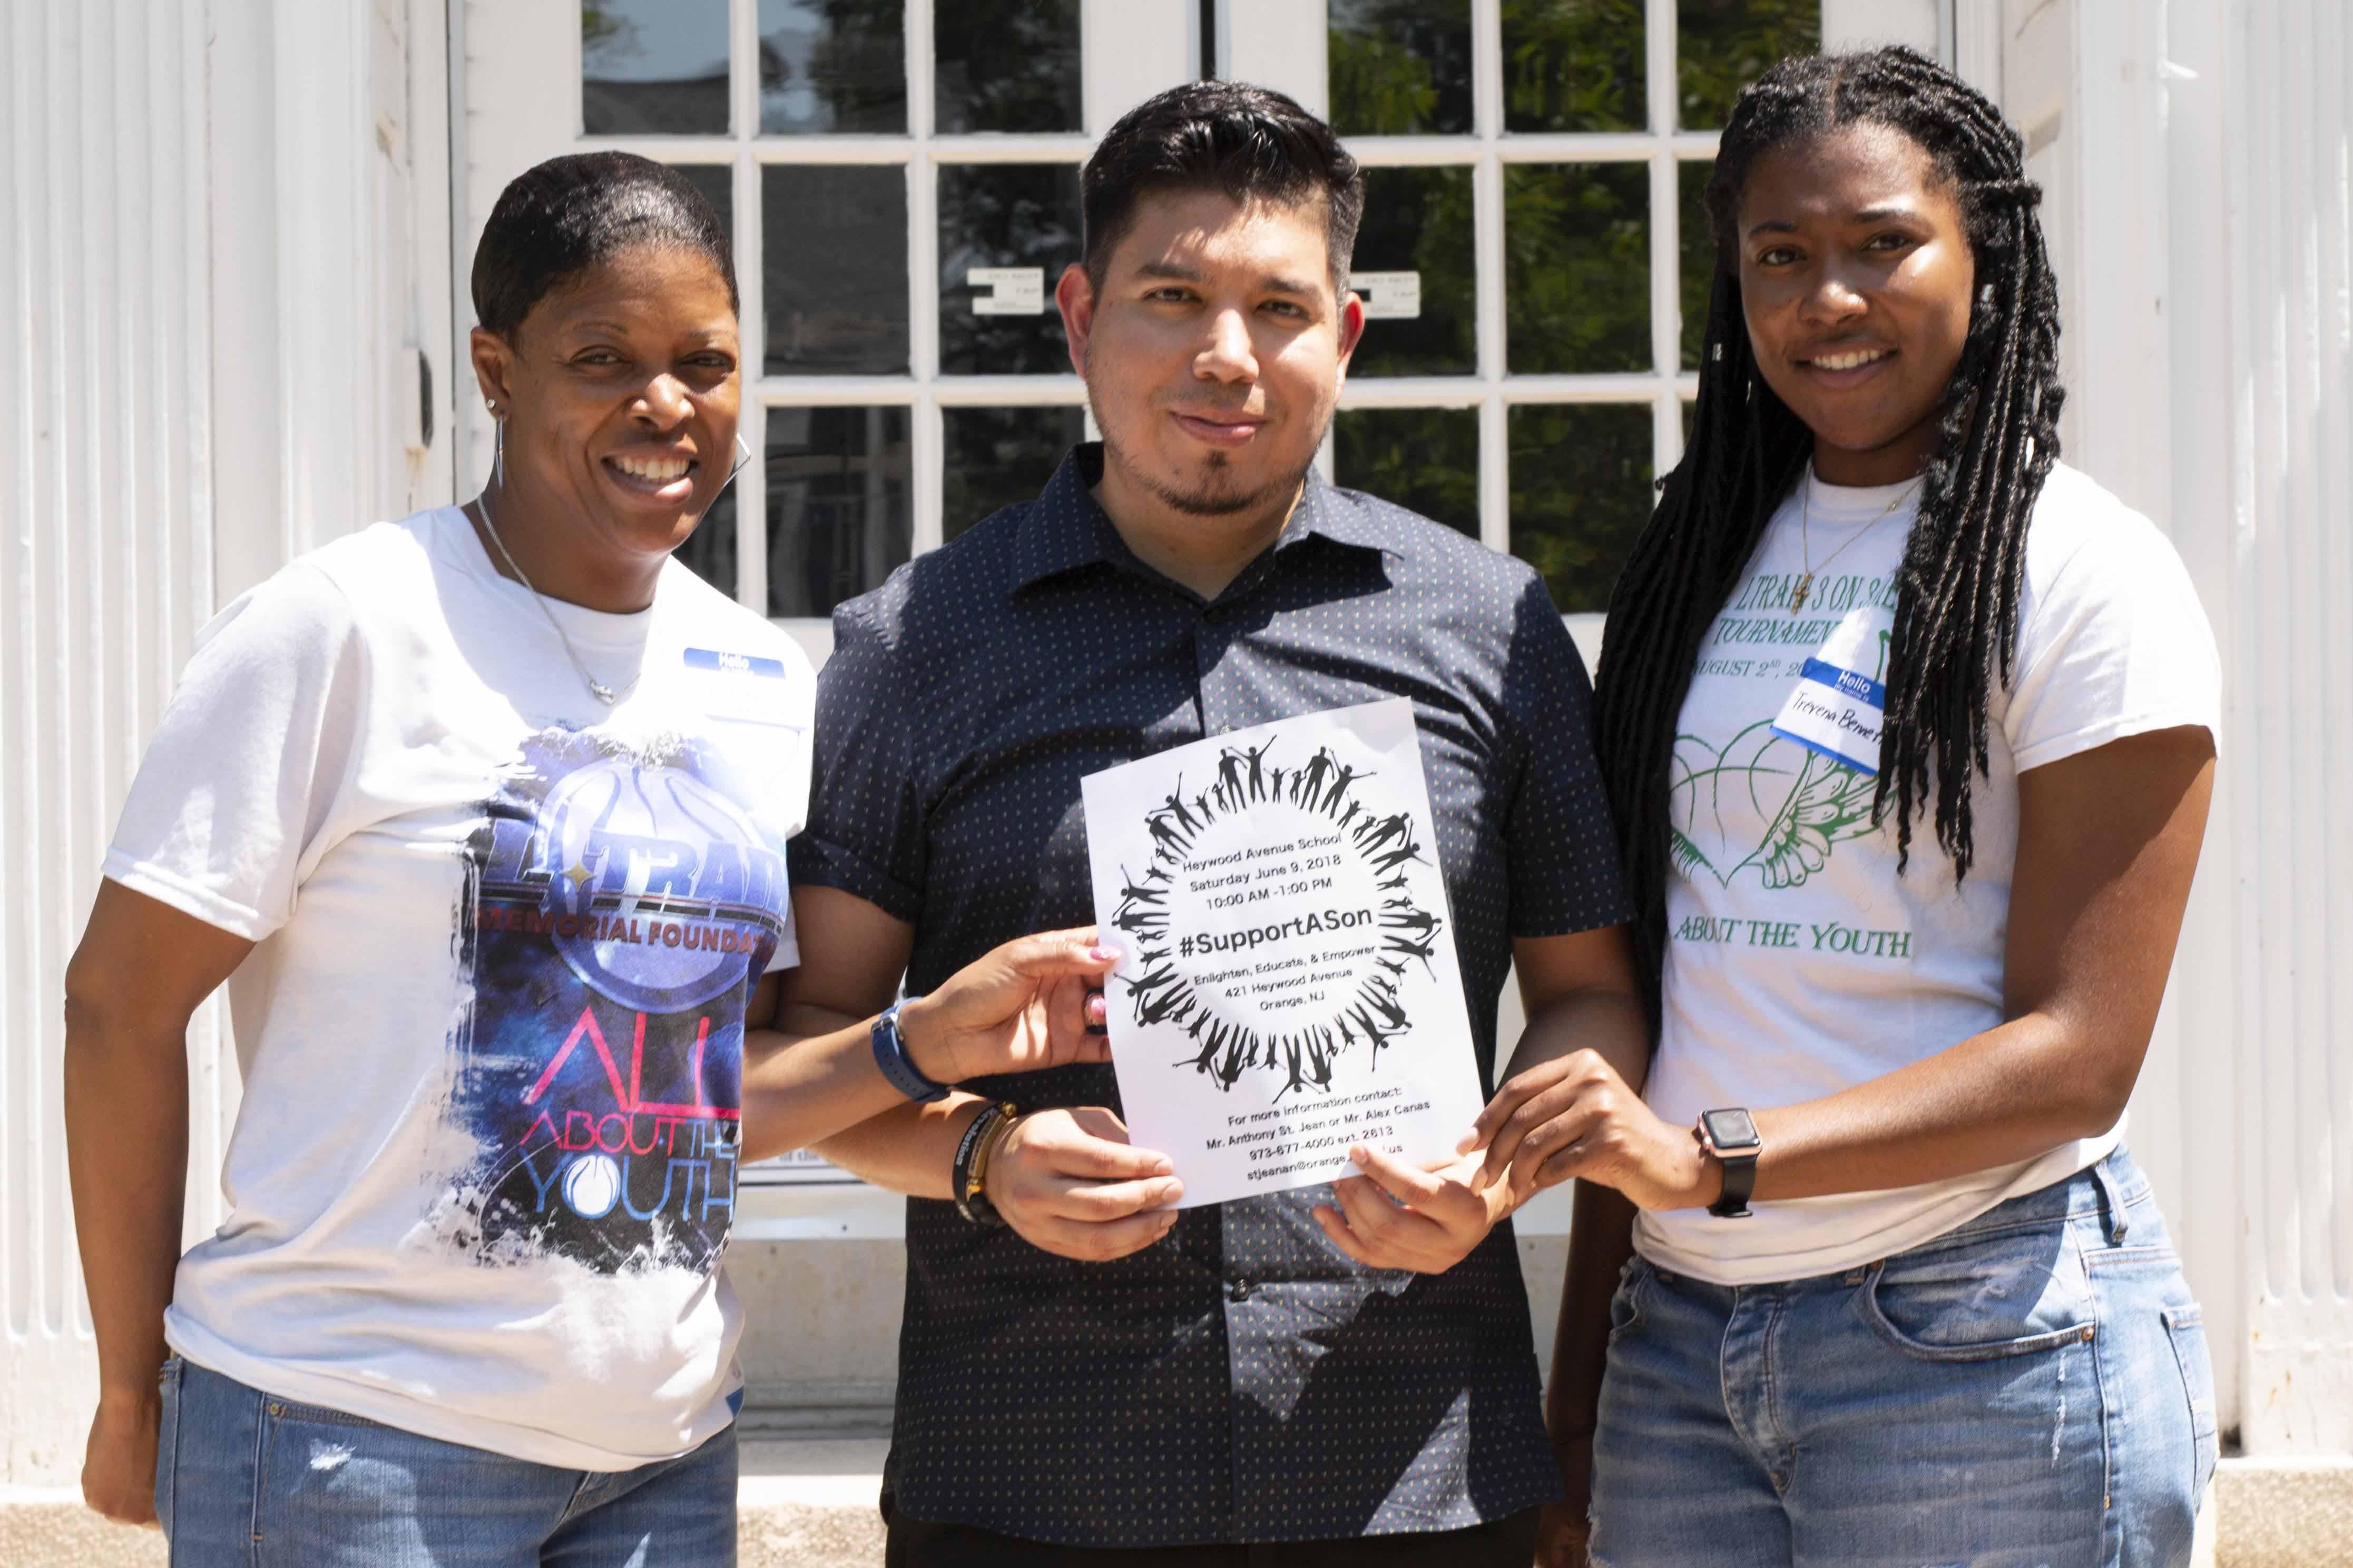 L-Train Memorial - #SupportASon (Heywood Avenue Elementary School, Orange NJ) 06-09-18_0039